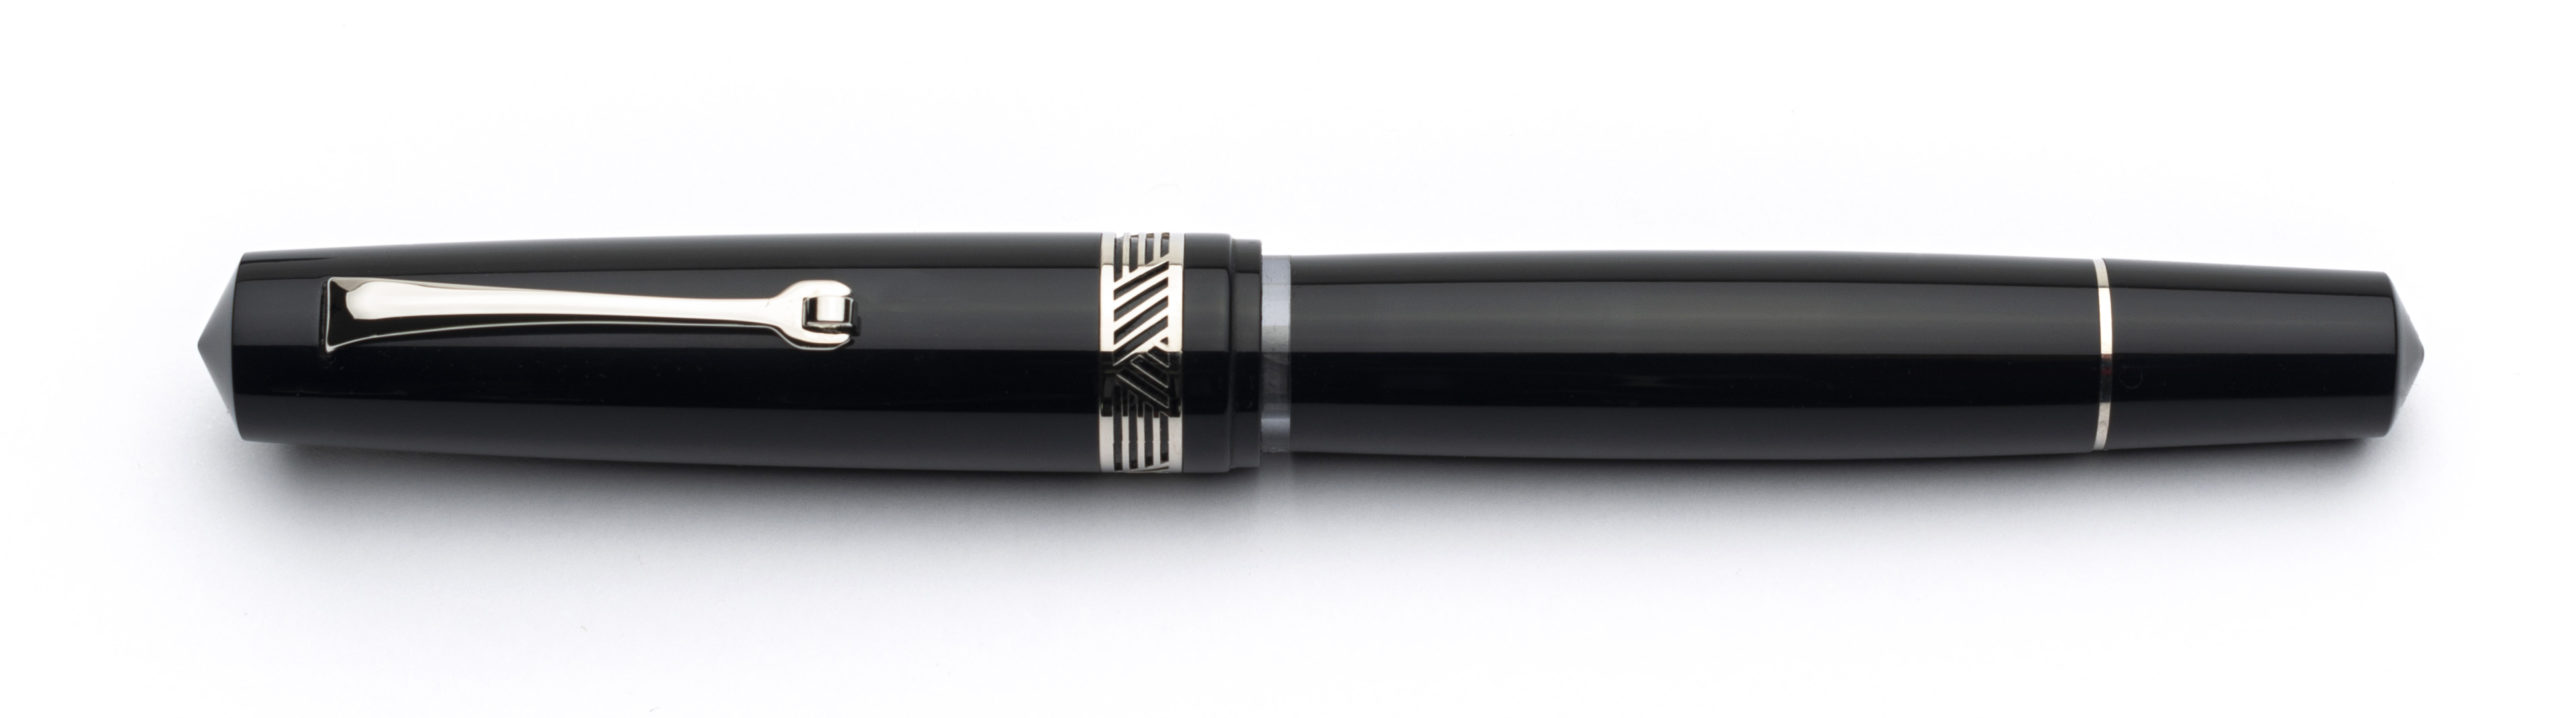 Leonardo Magico Glossy Black Silver